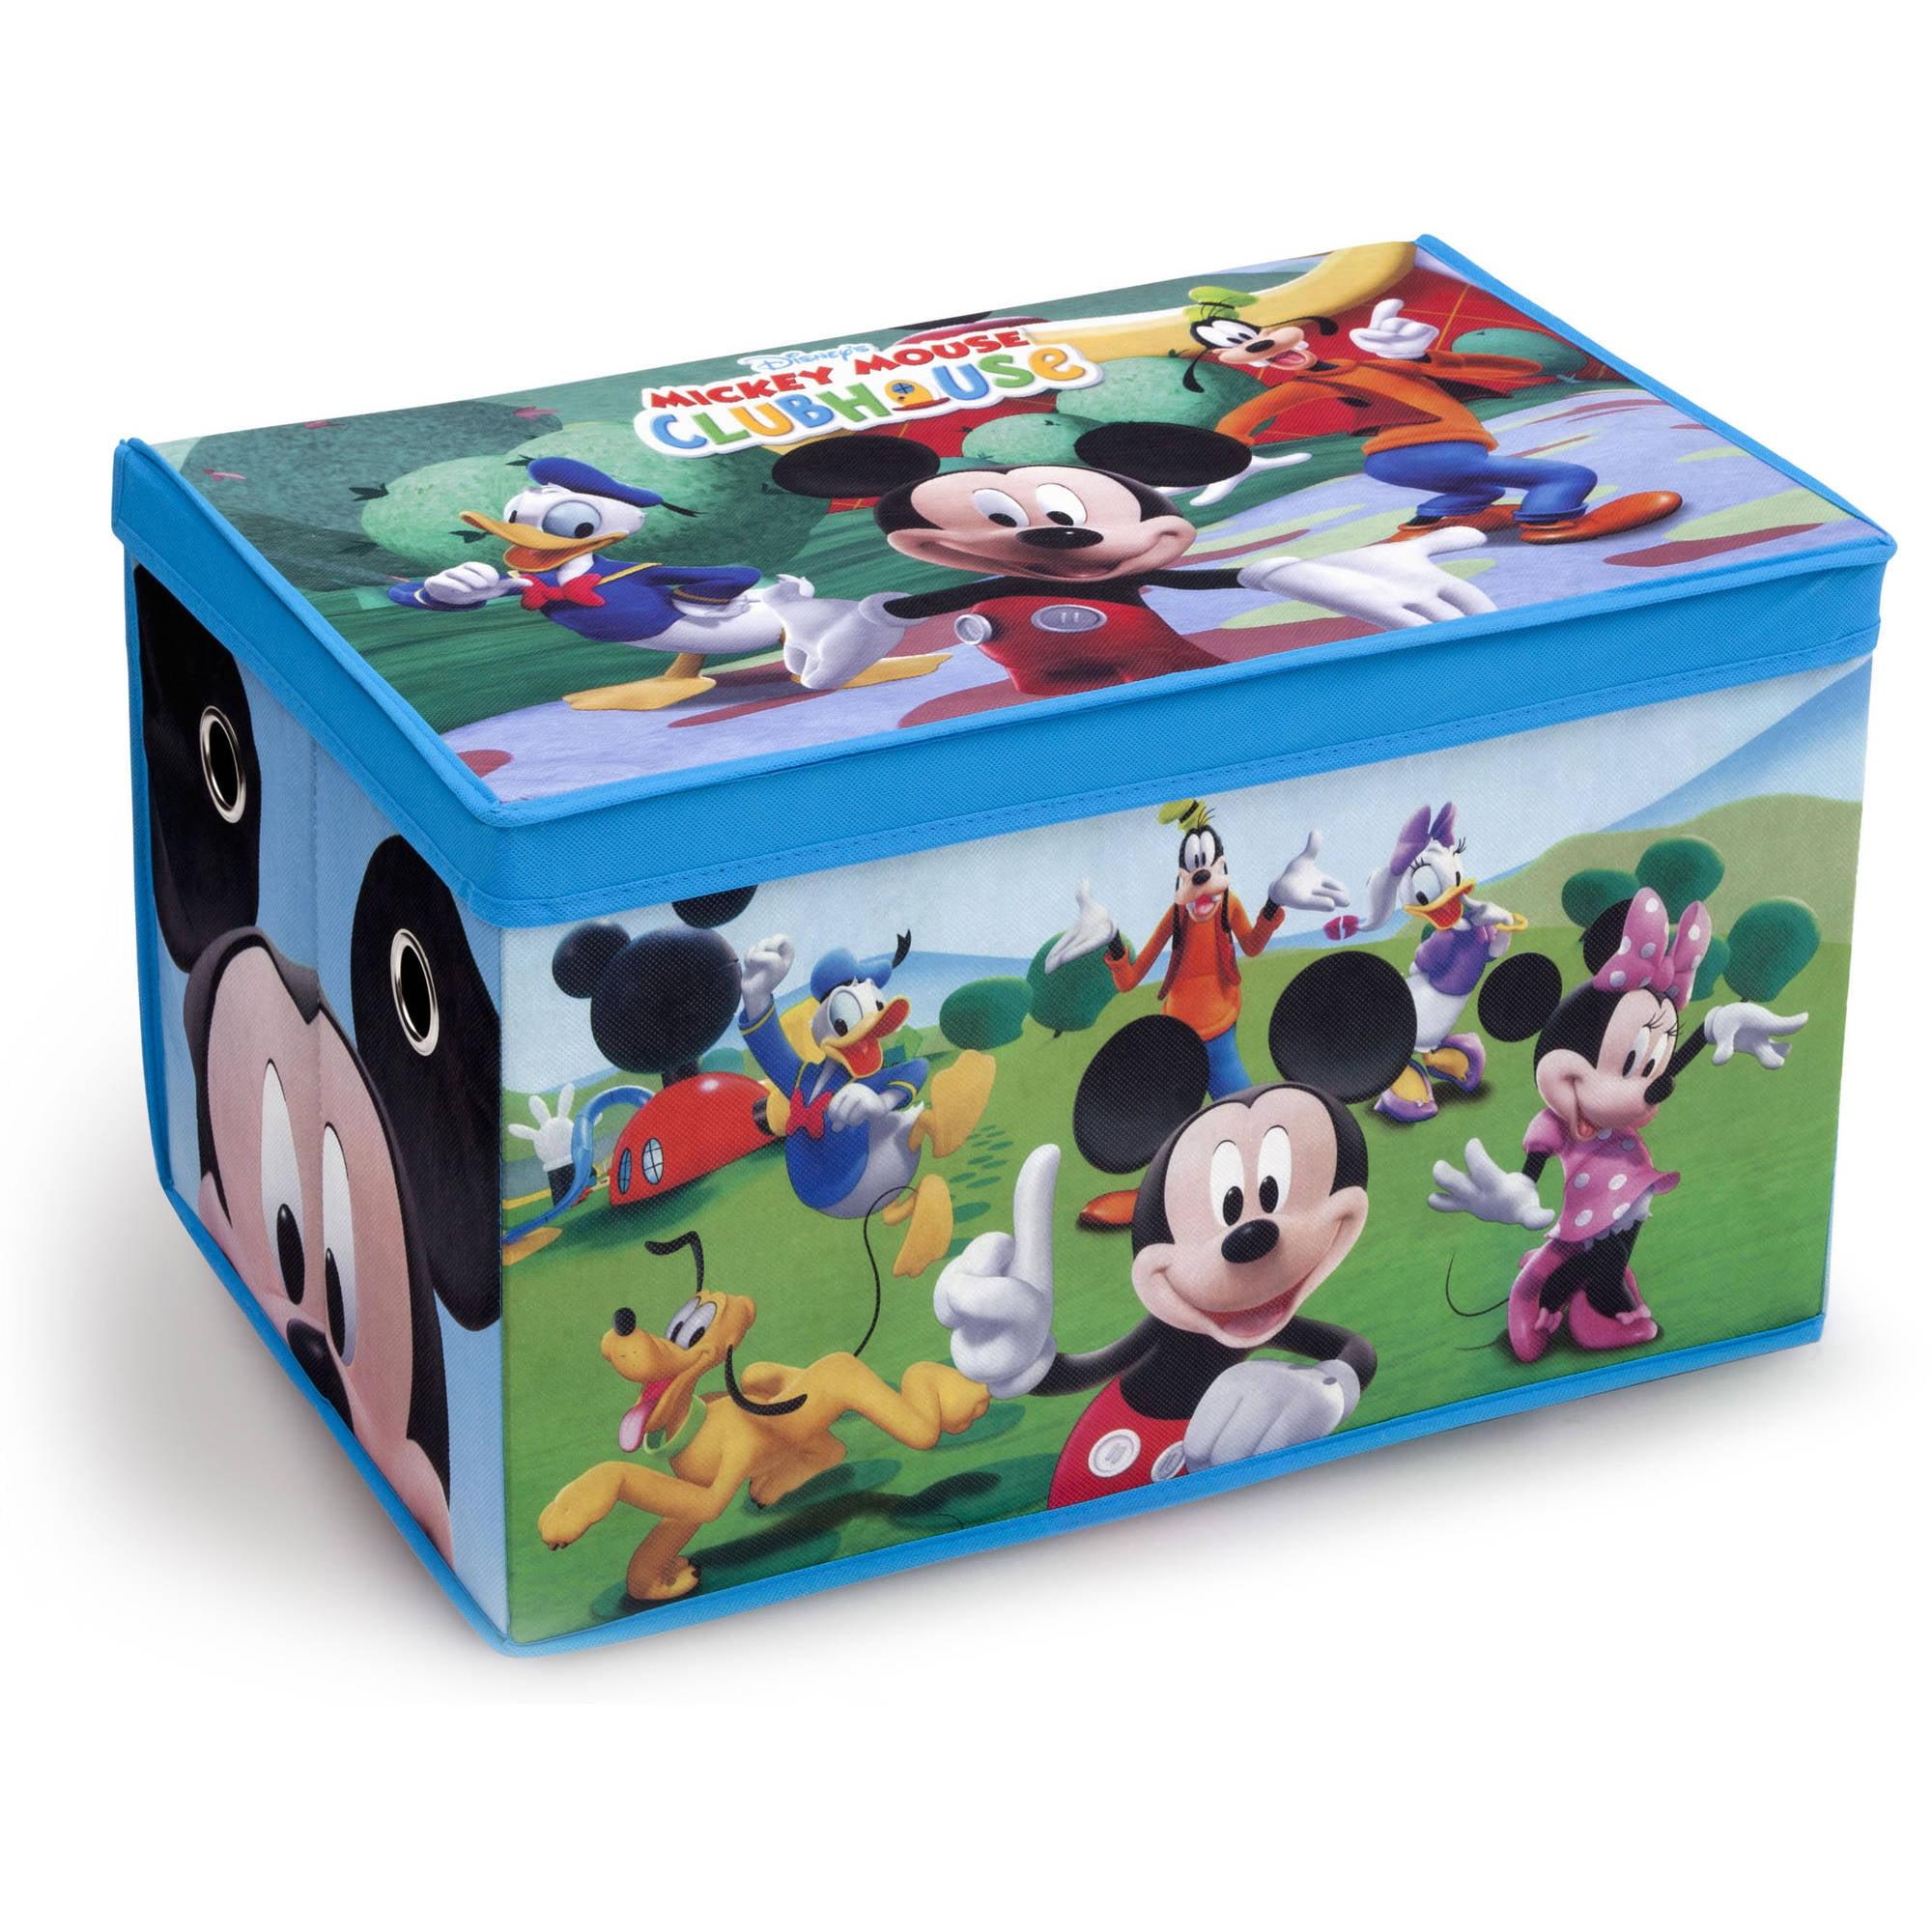 Disney Mickey Mouse Fabric Toy Box